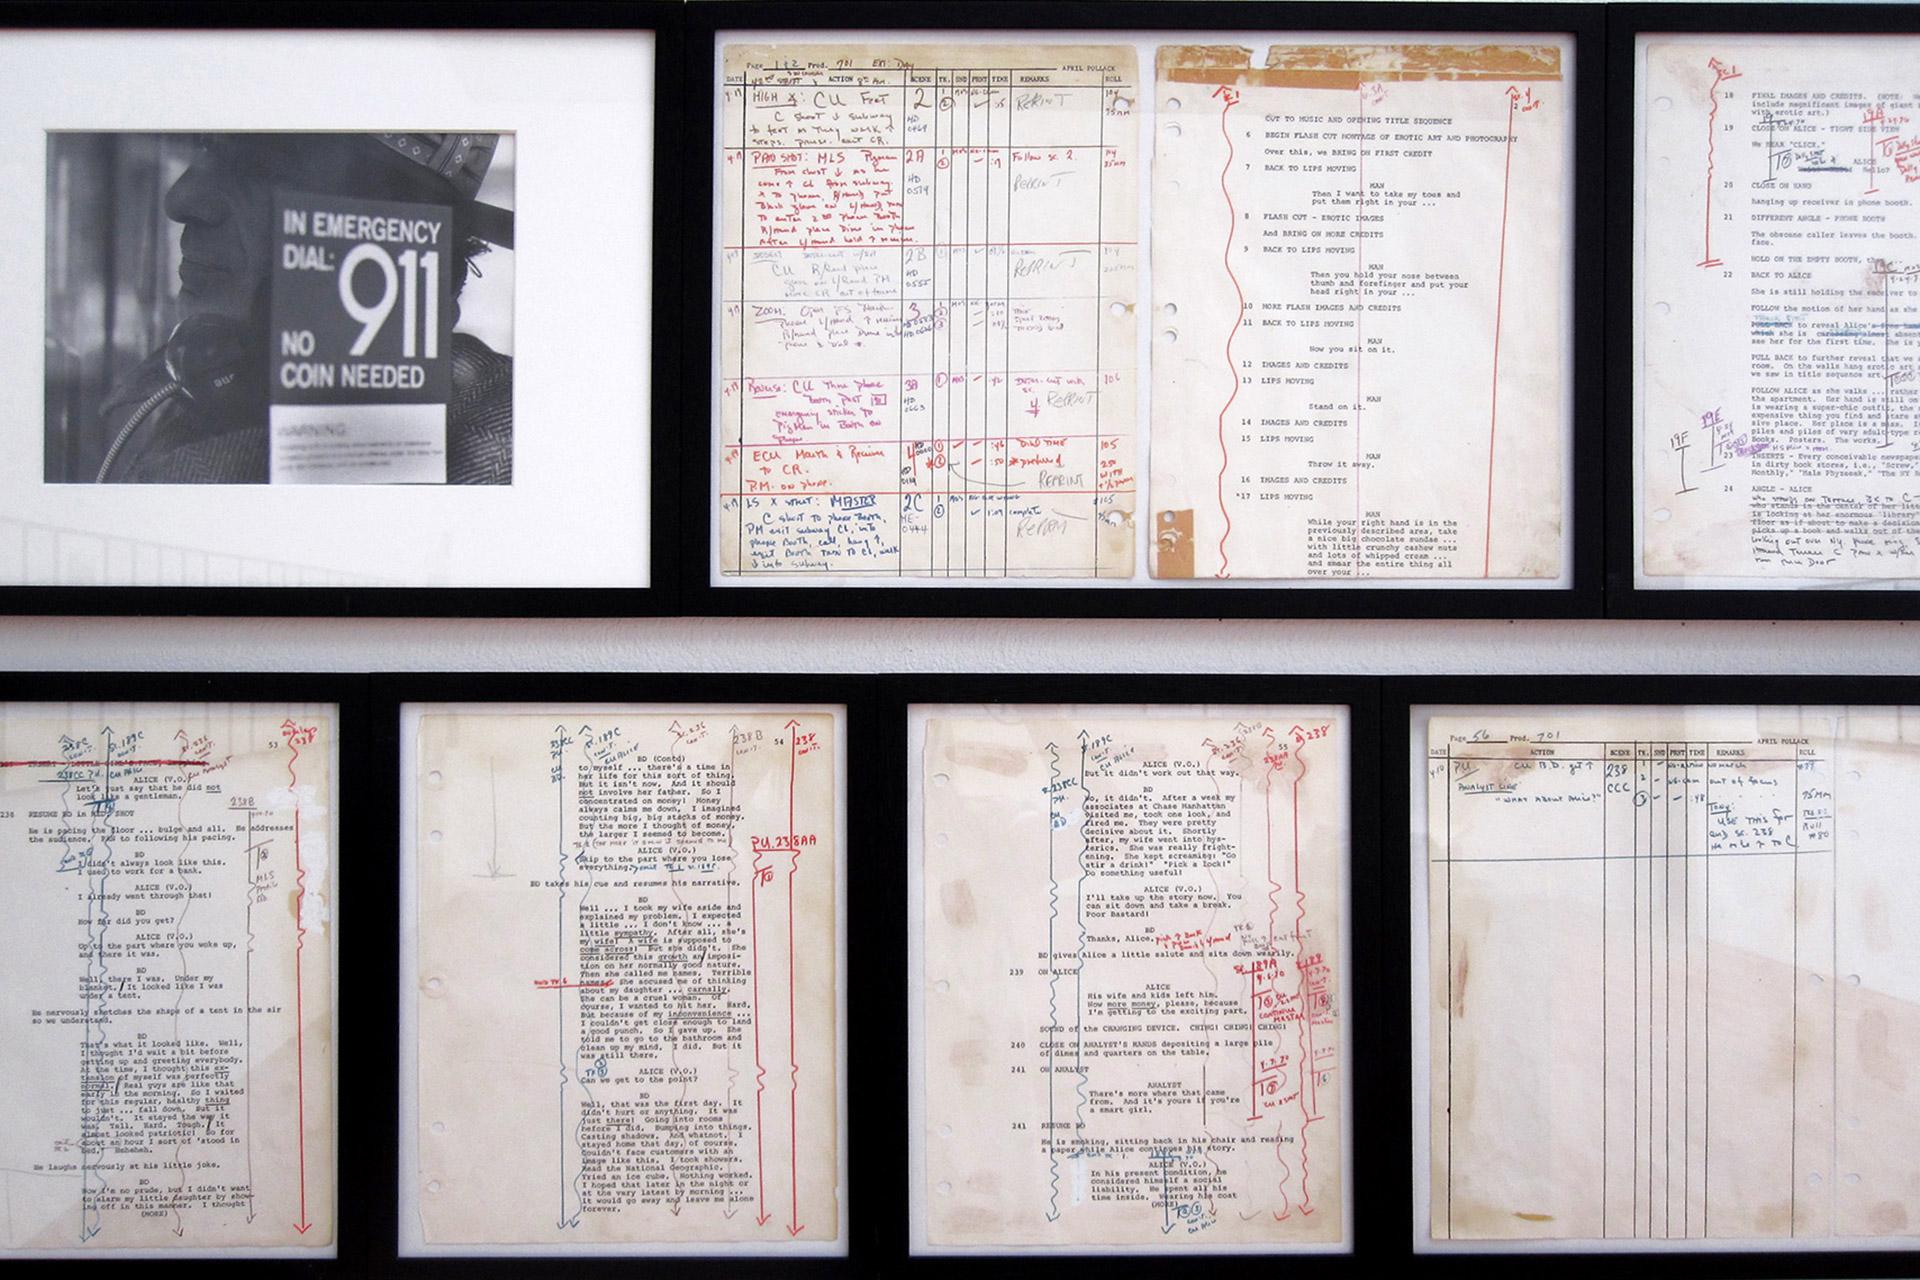 Telephone-Book-Kunsthalle-Winterthur-2010-4.jpg